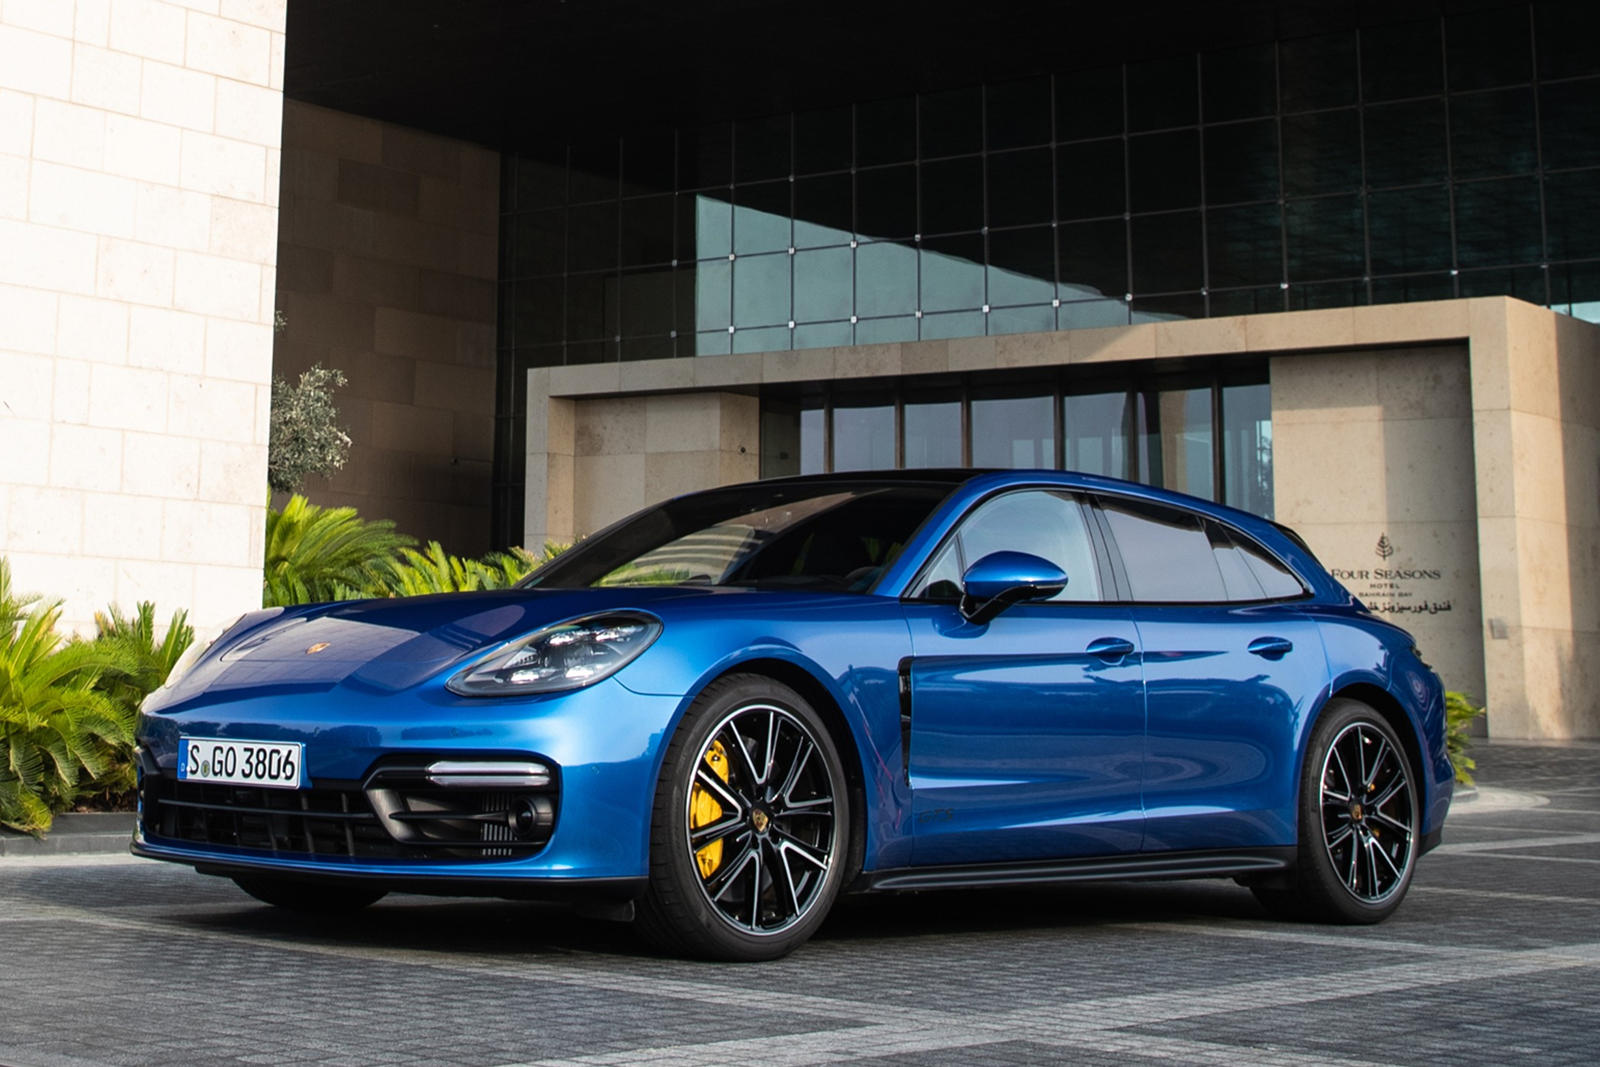 2020 Porsche Panamera Sport Turismo Review Trims Specs Price New Interior Features Exterior Design And Specifications Carbuzz